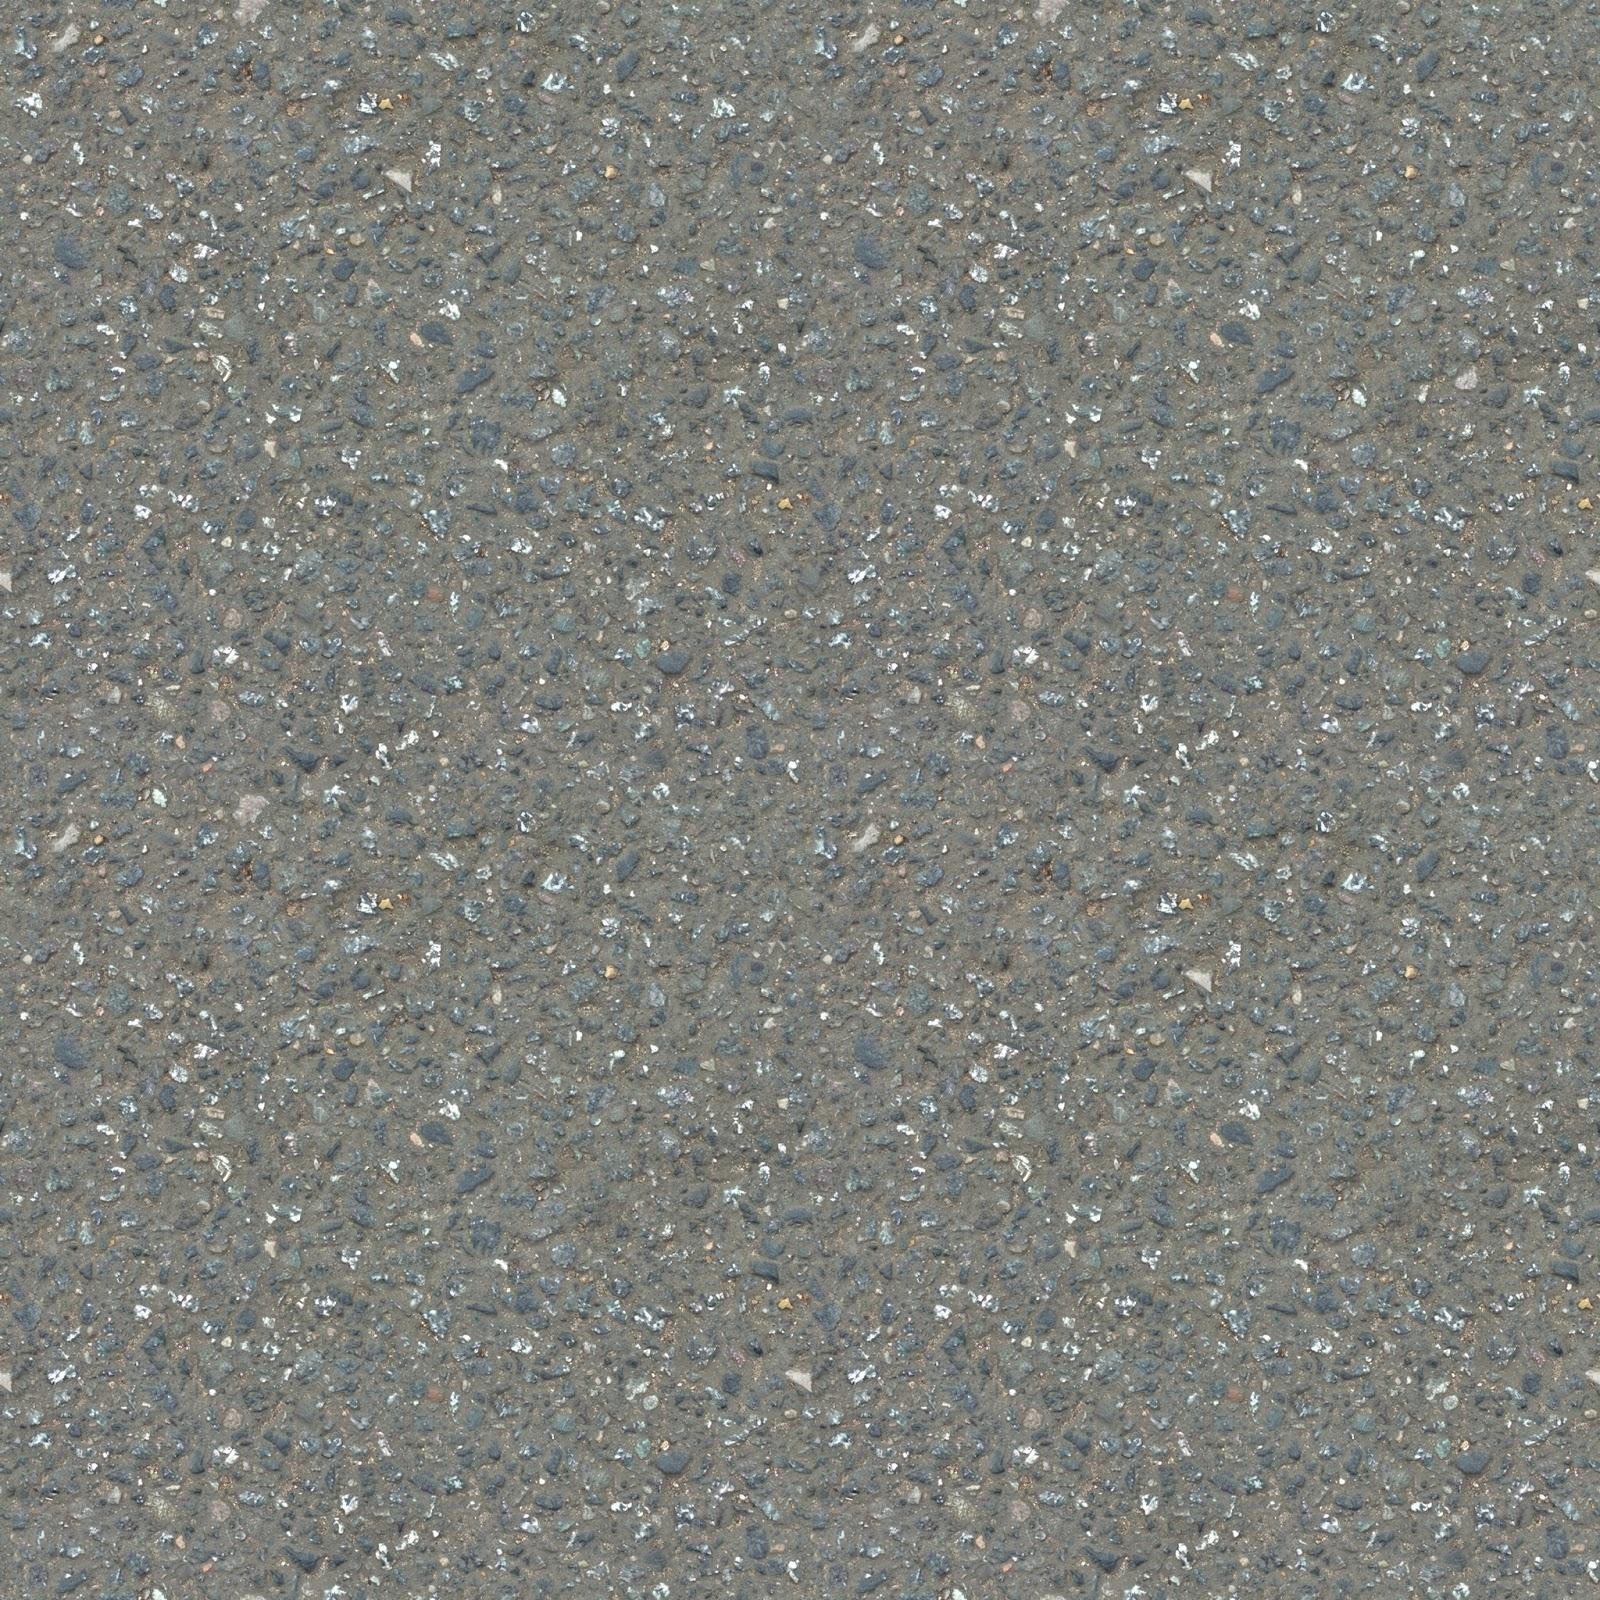 CONCRETE 17 Seamless Floor Granite Stones Texture 2048x2048